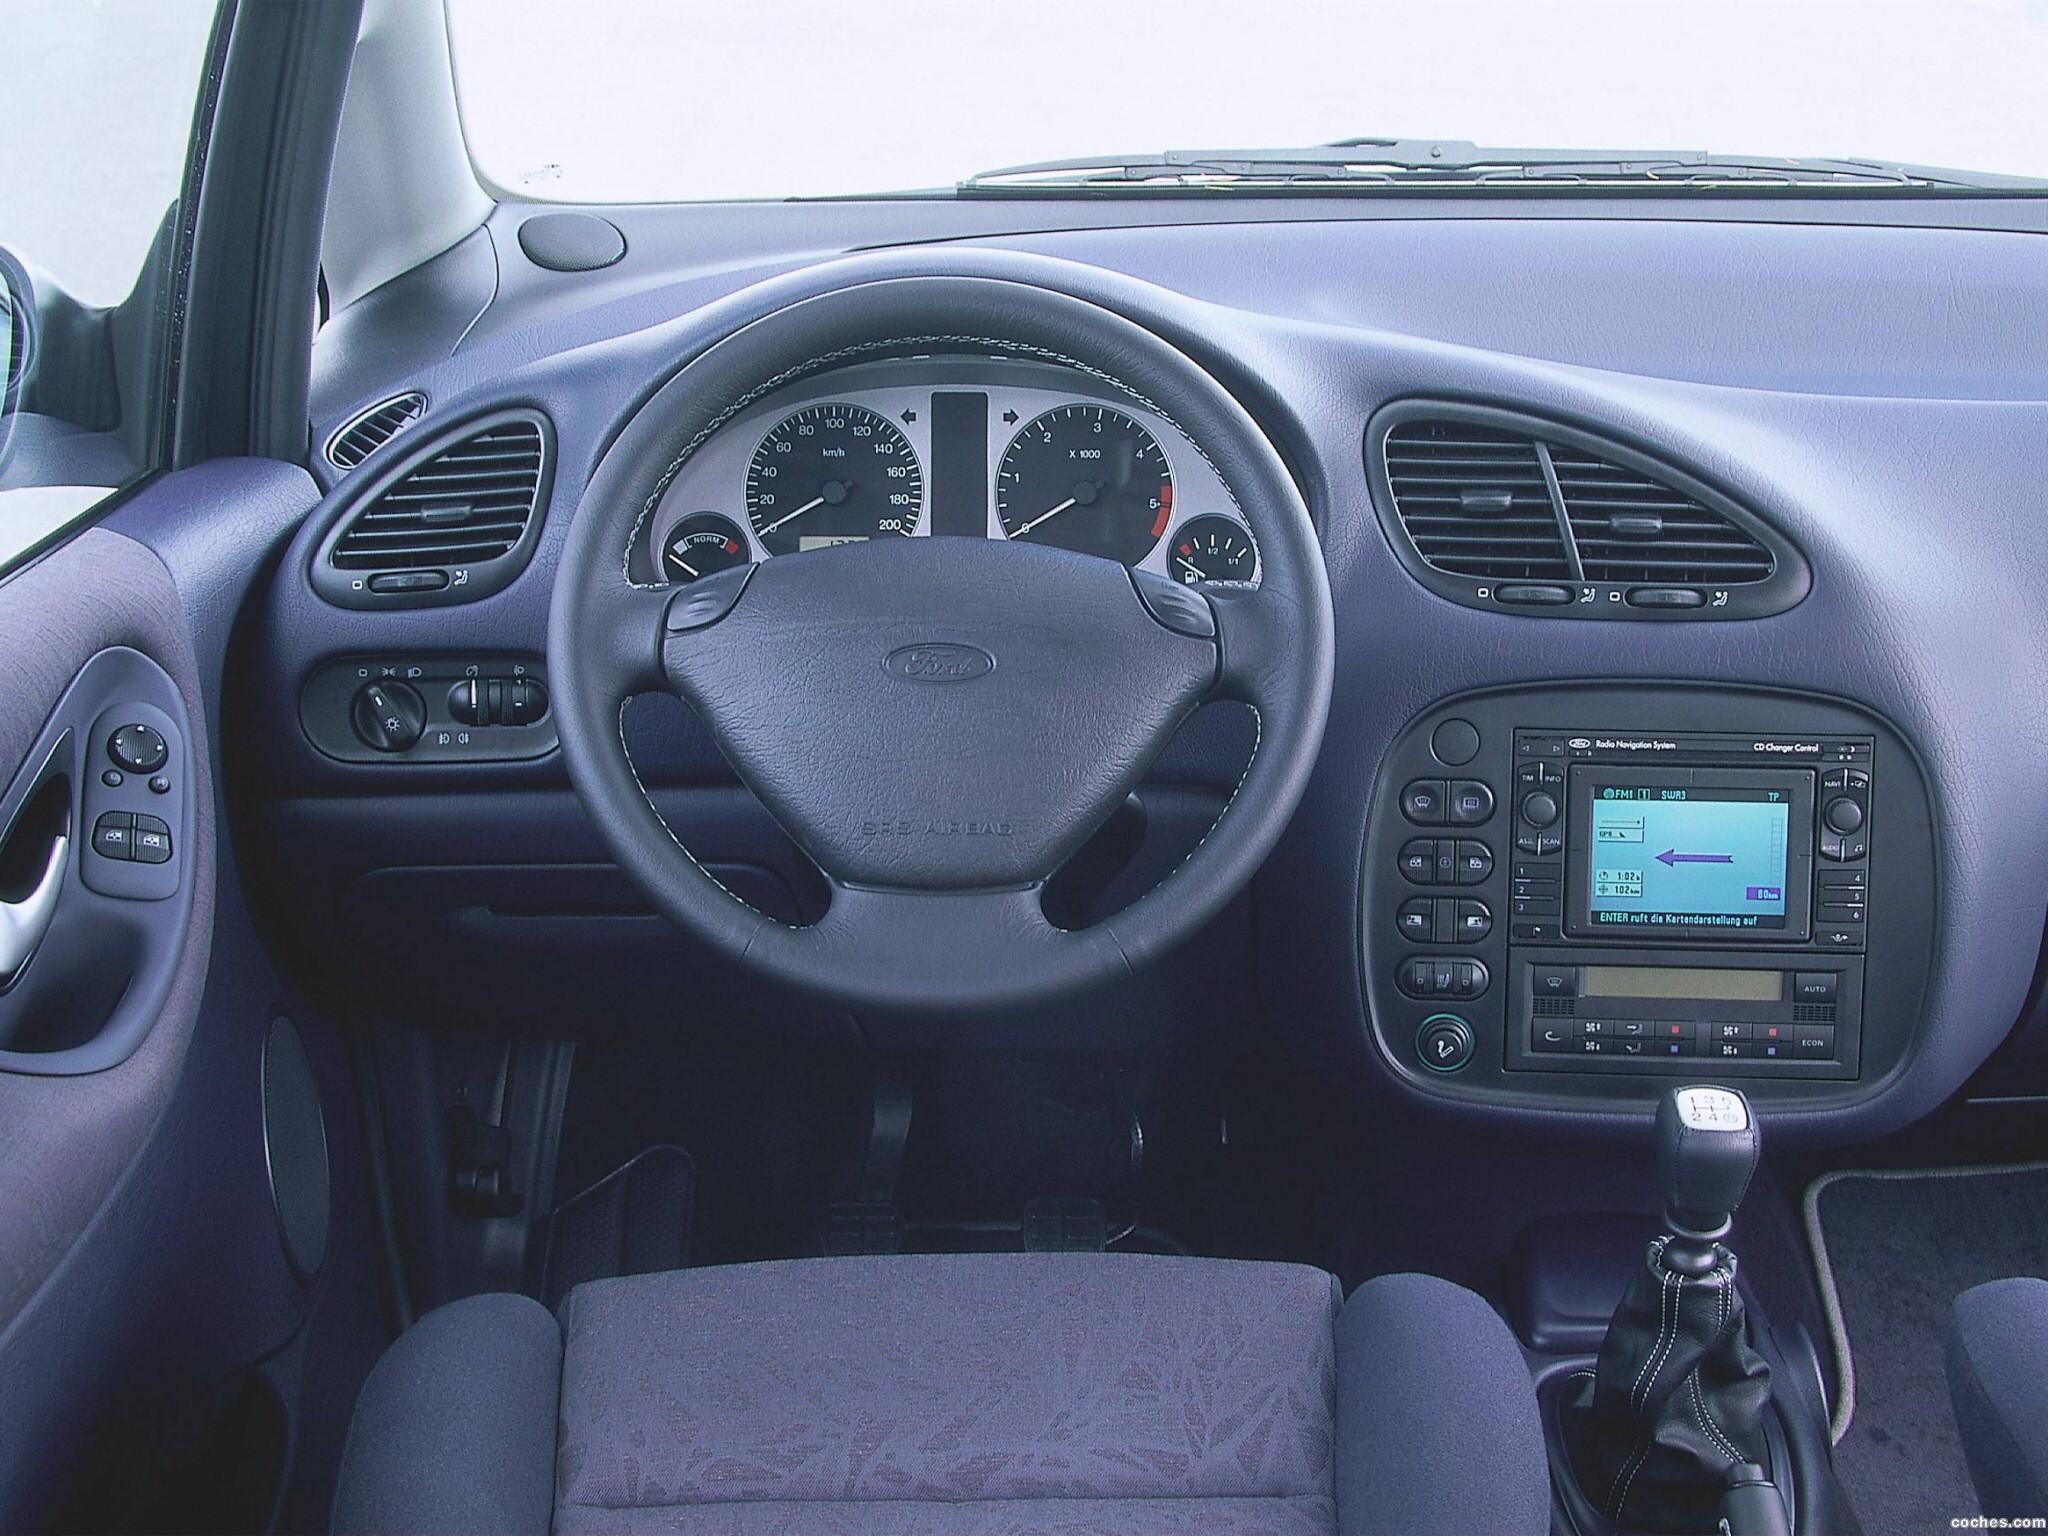 Foto 5 de Ford Galaxy 1995